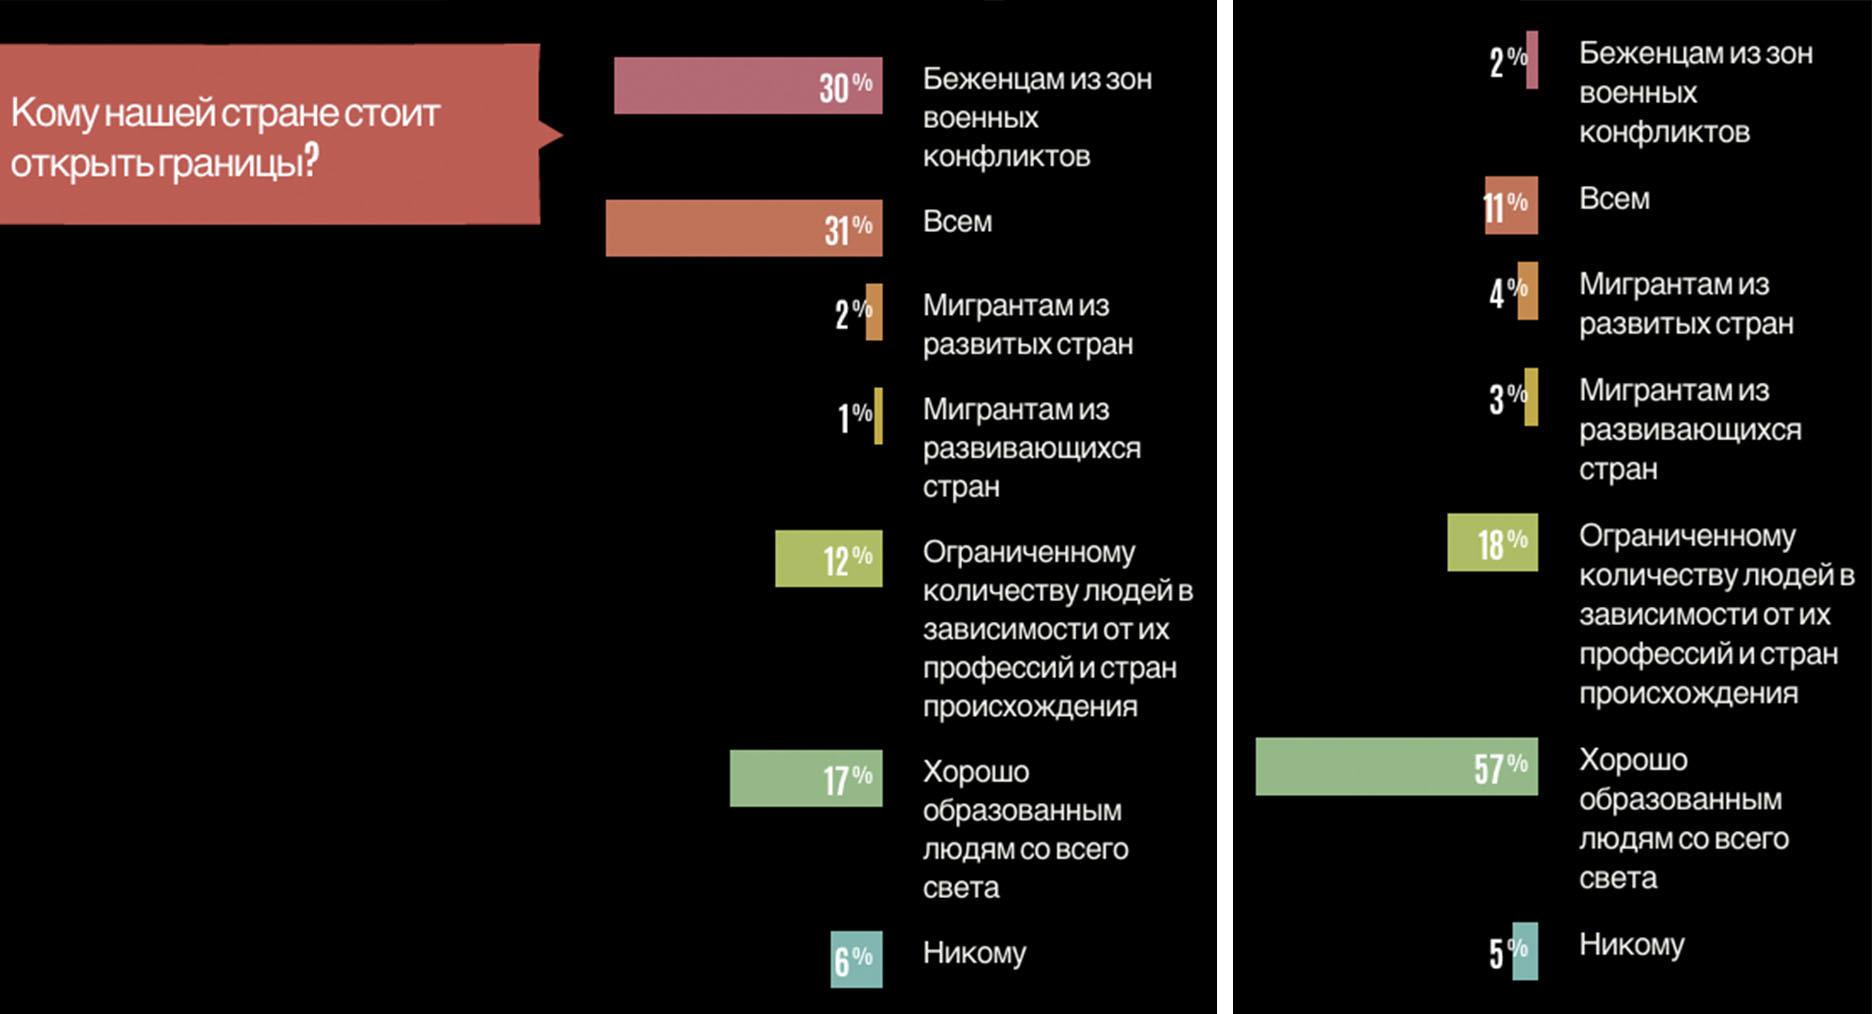 Слева данные по Европе, справа – по Беларуси